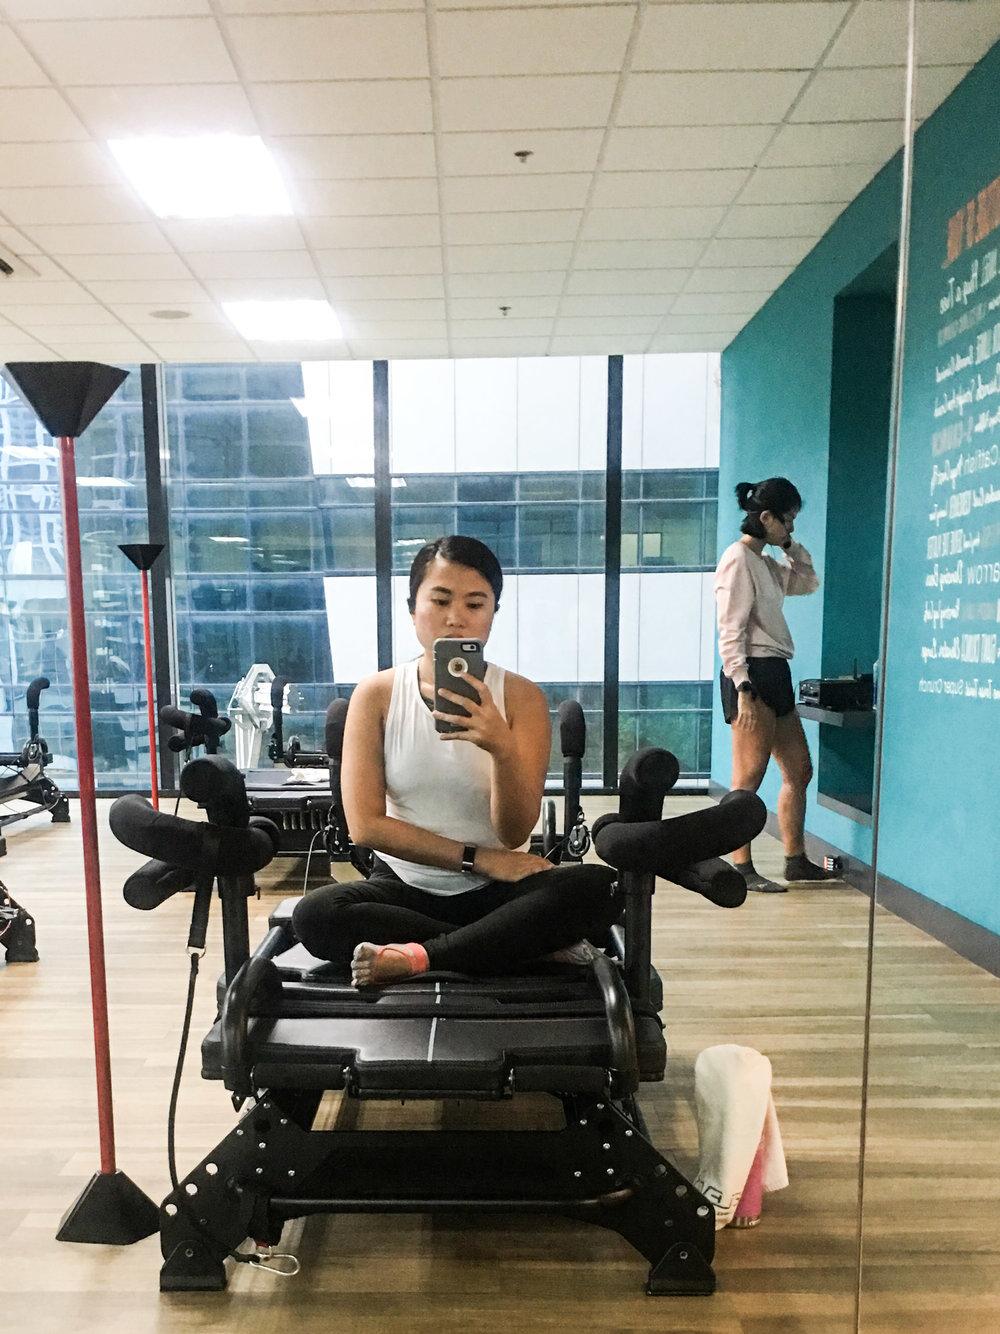 Elev8 Lagree Fitness